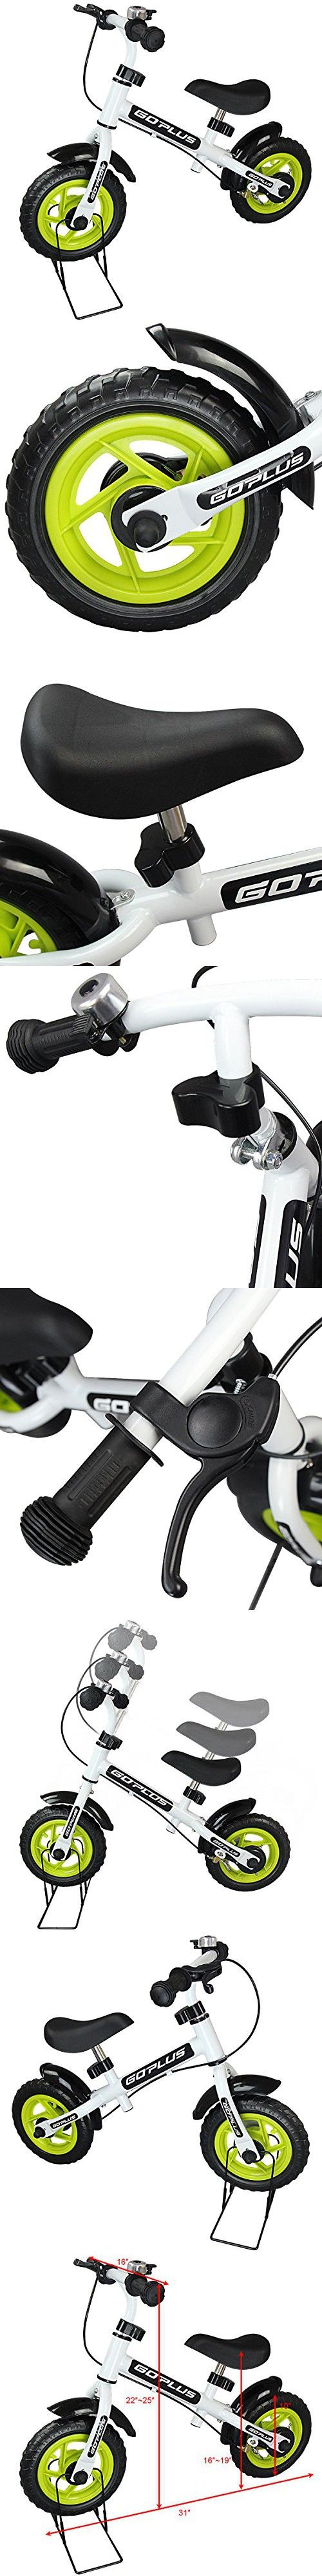 "Goplus 10"" Kids Balance Bike No Pedal Learn To Ride Pre Bike Push Walking"